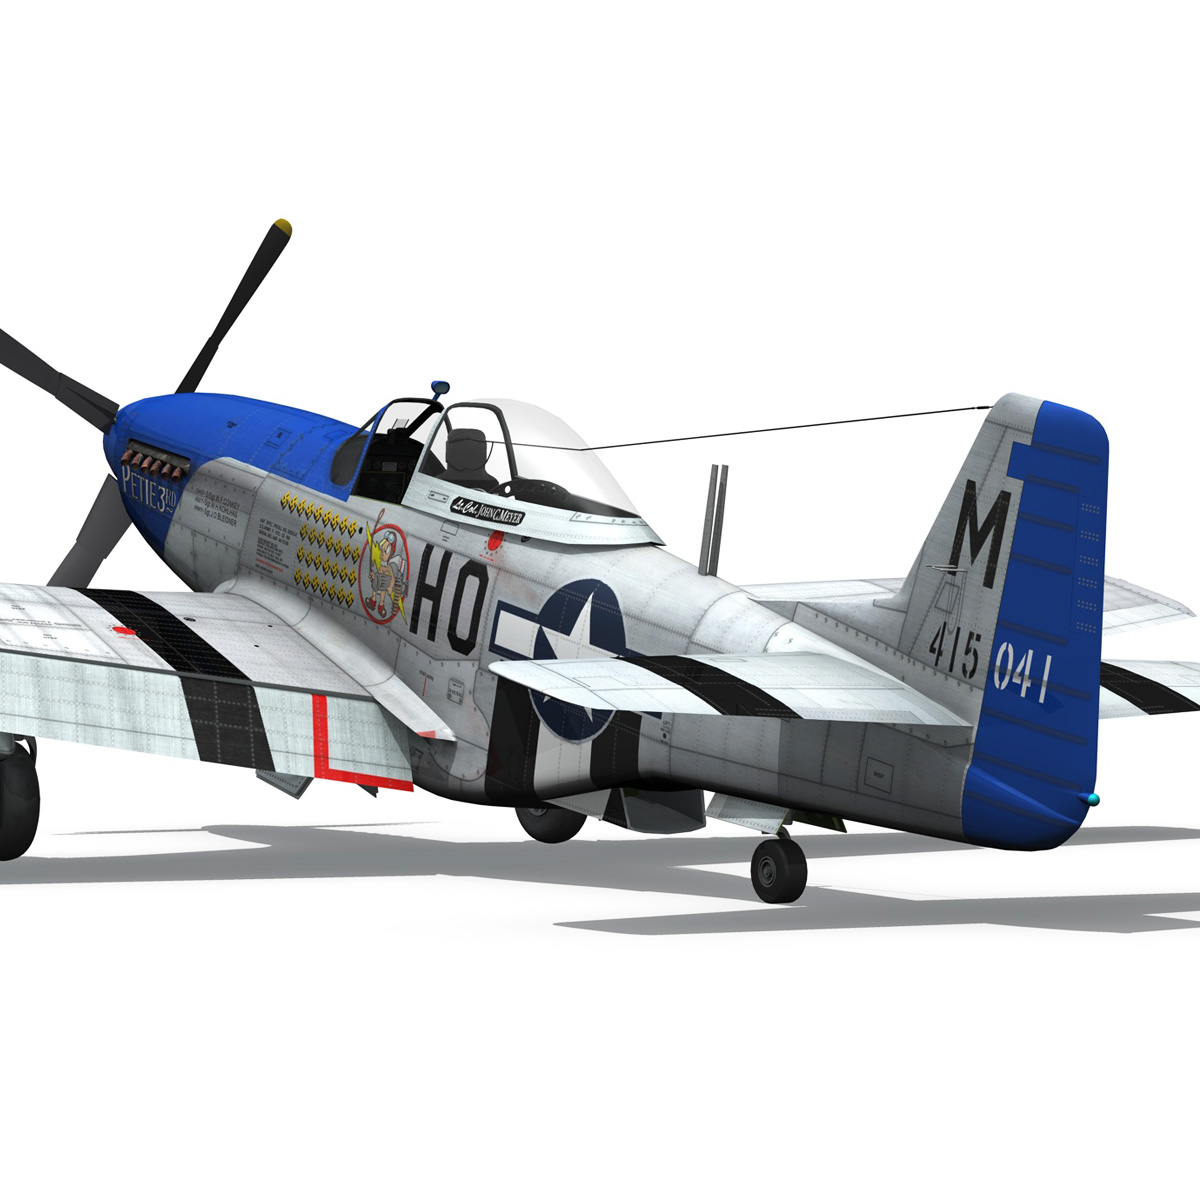 north american p-51d mustang – petie 3rd 3d model fbx c4d lwo obj 280139